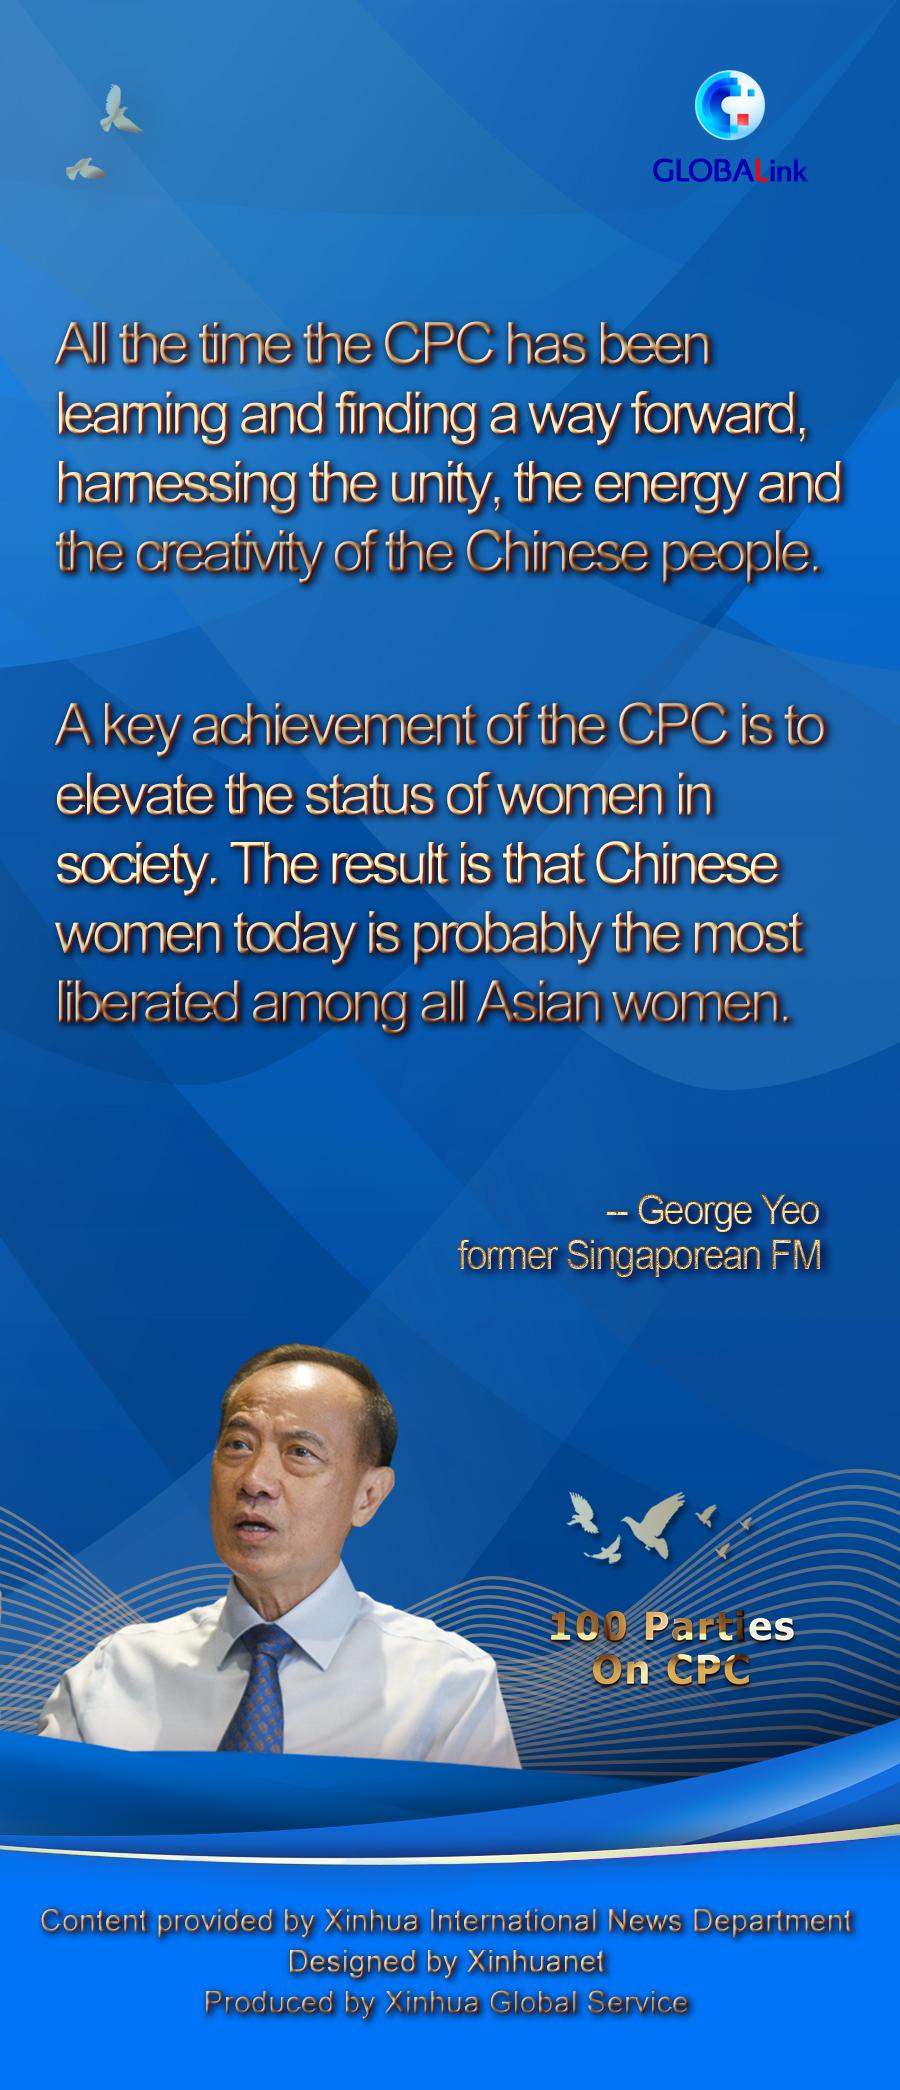 Interview: 100th anniversary of CPC a milestone in China's development -- former Singaporean FM - Xinhua | English.news.cn